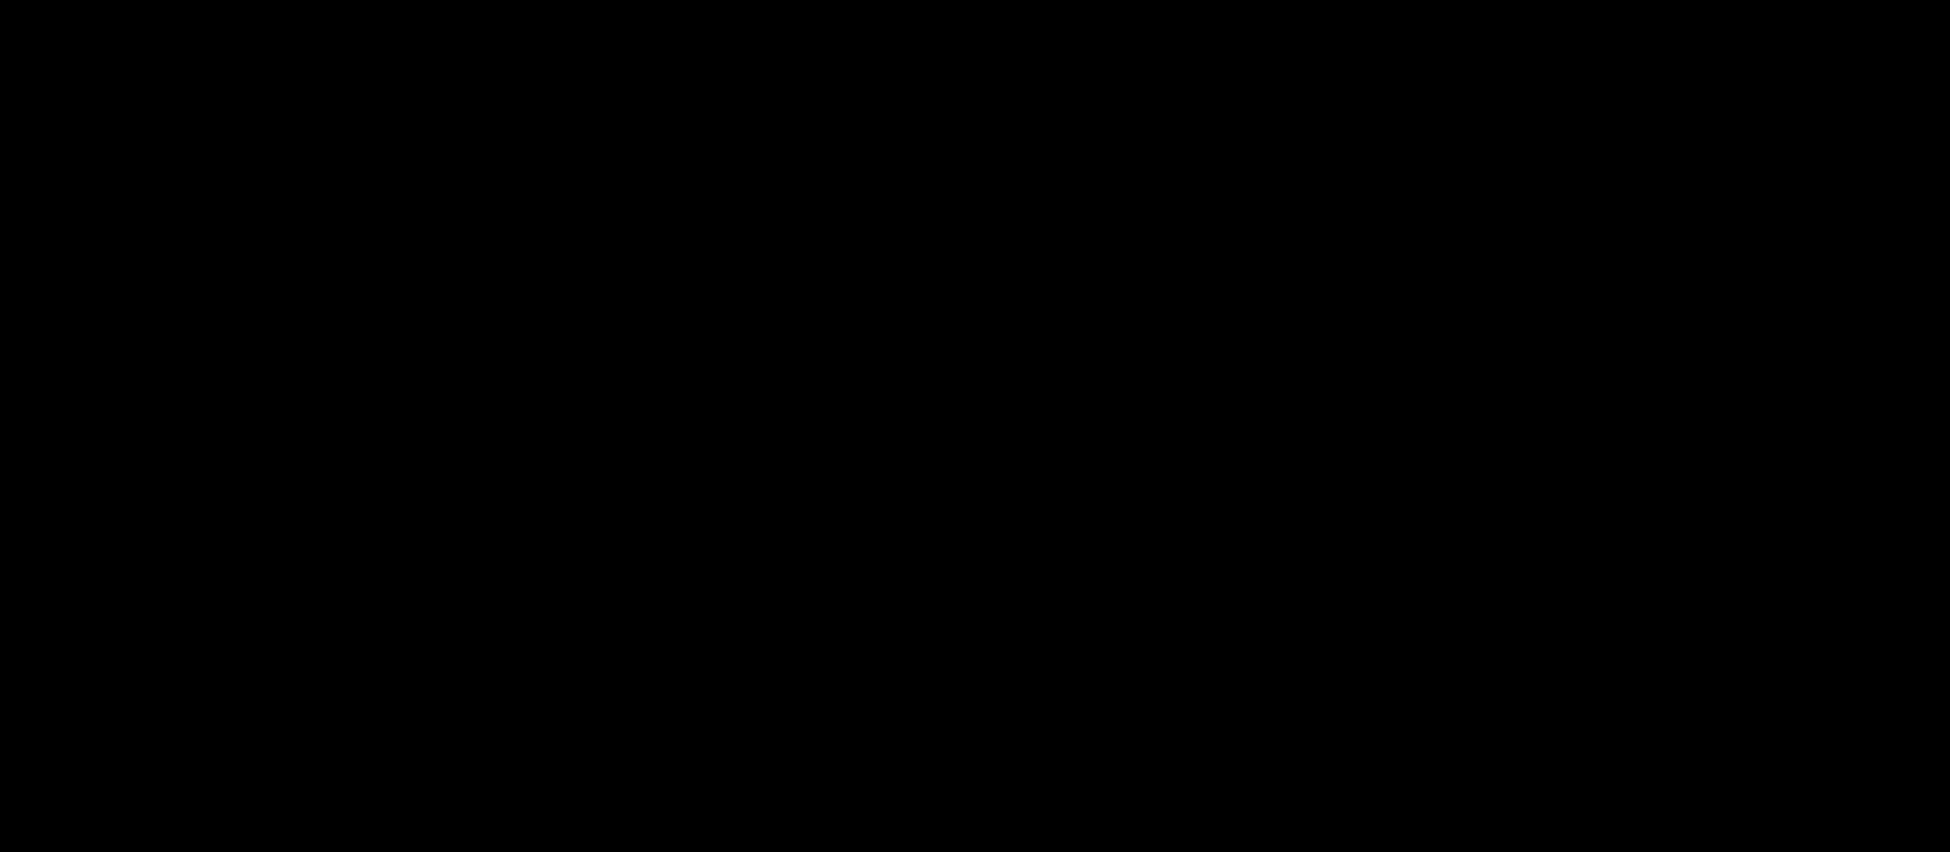 6-O-Dansyl-<sup>13</sup>C<sub>2</sub>-glcosamine trifluoroacetate